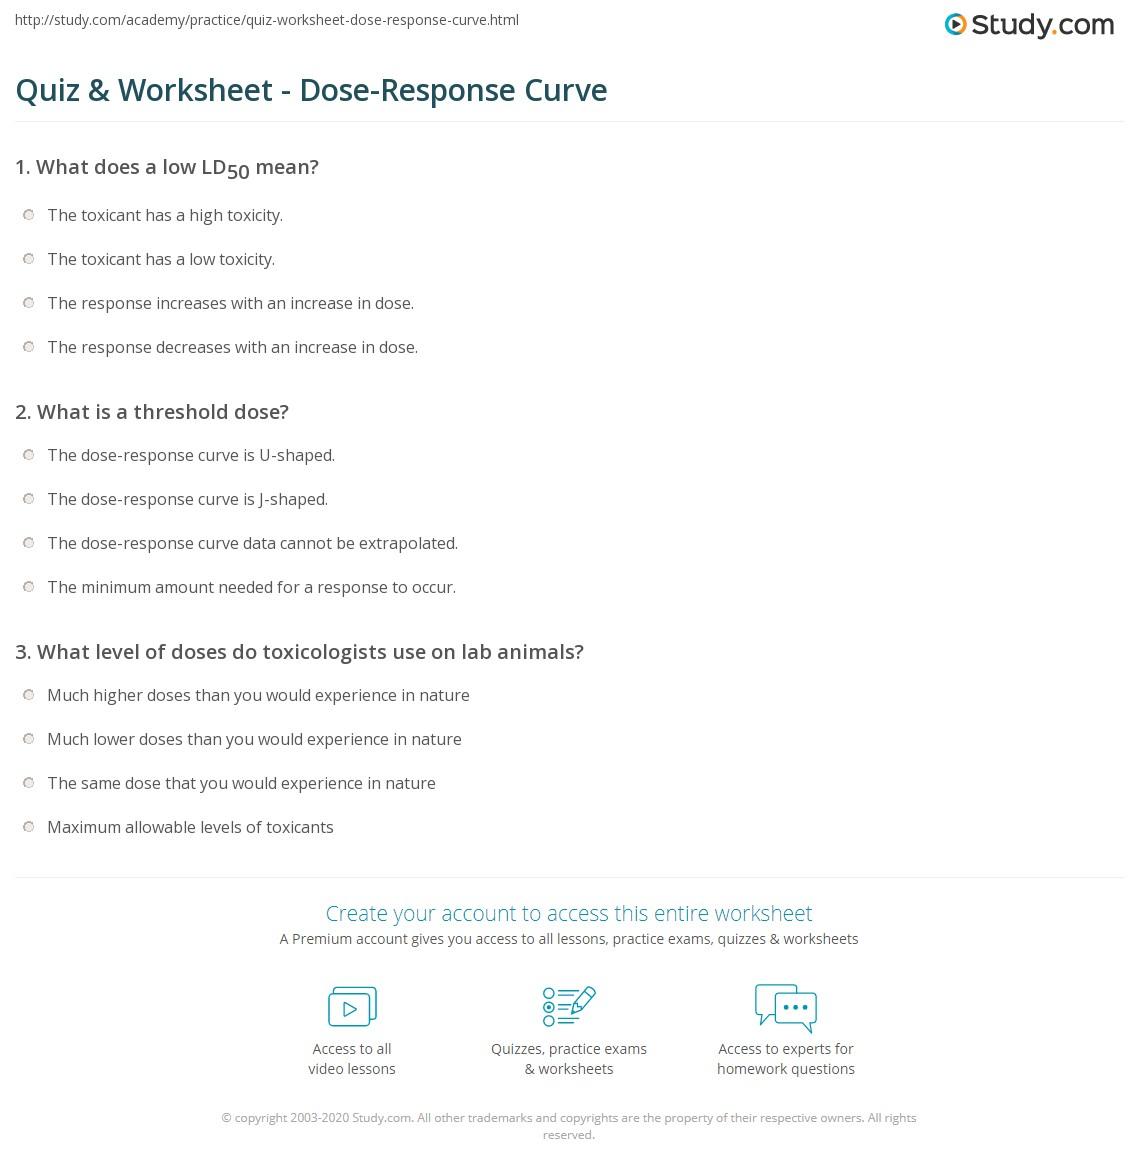 dose response curve